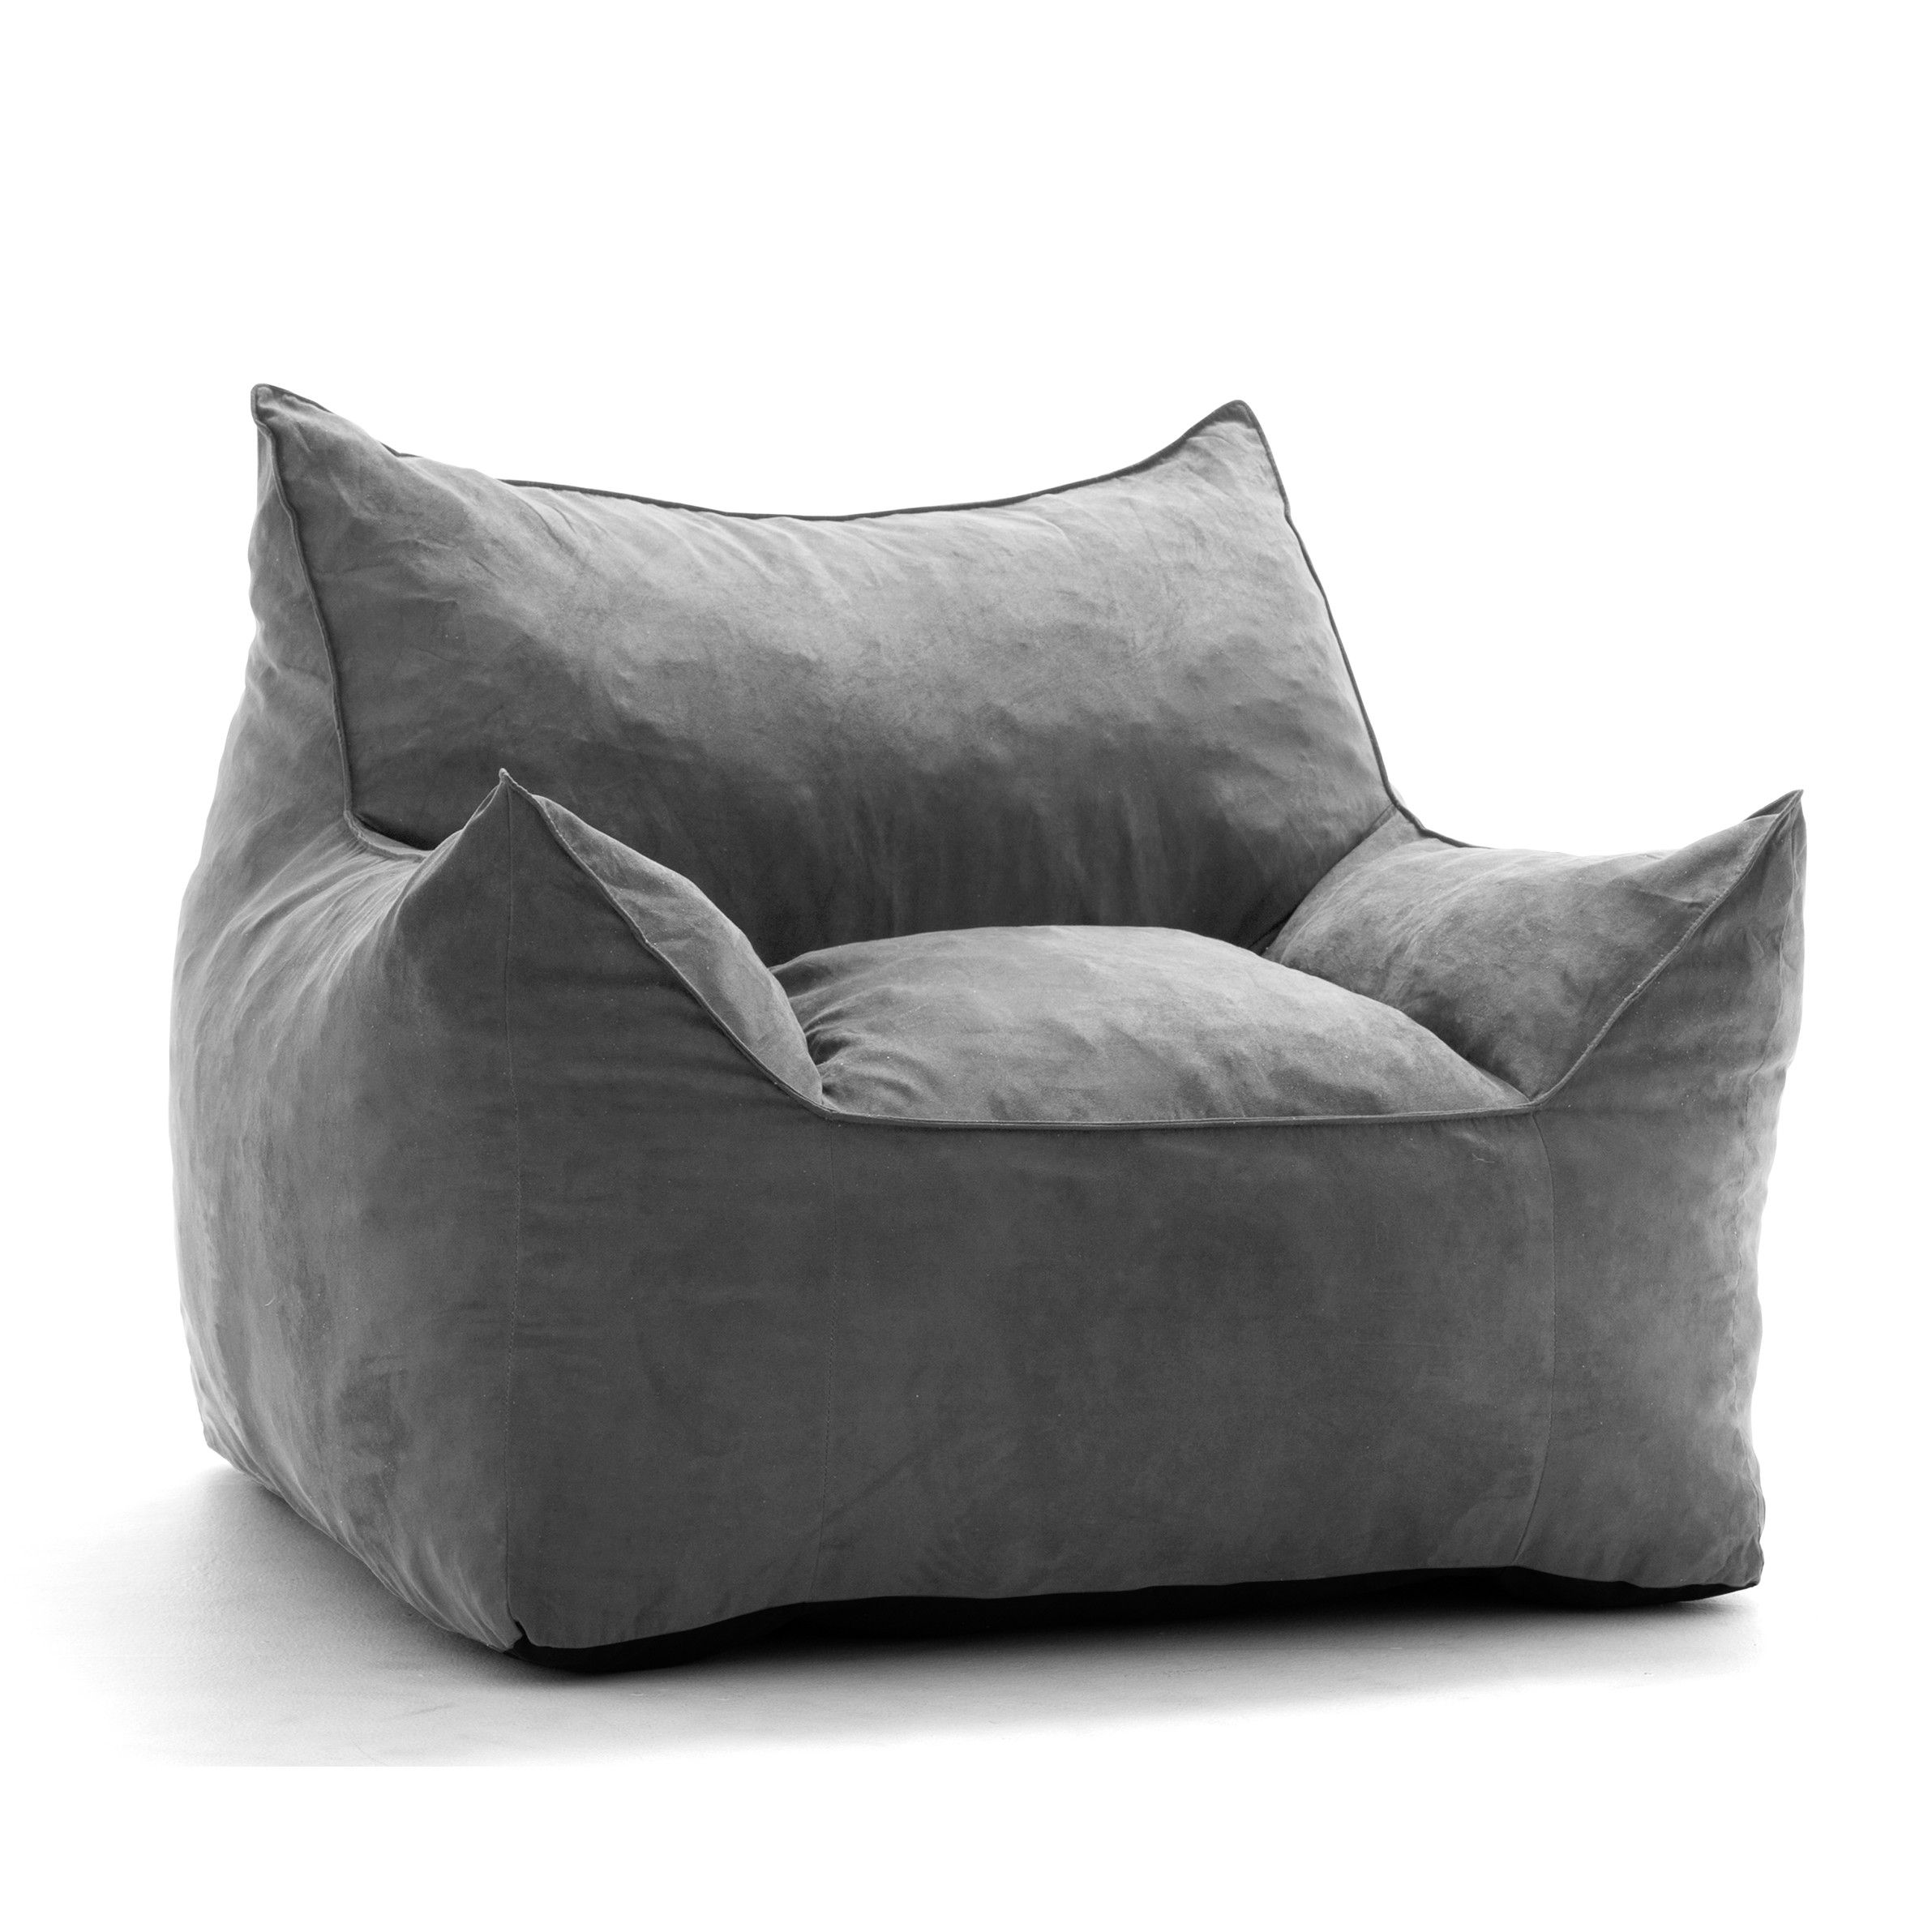 Customer Image Zoomed Bean bag lounger, Bean bag chair